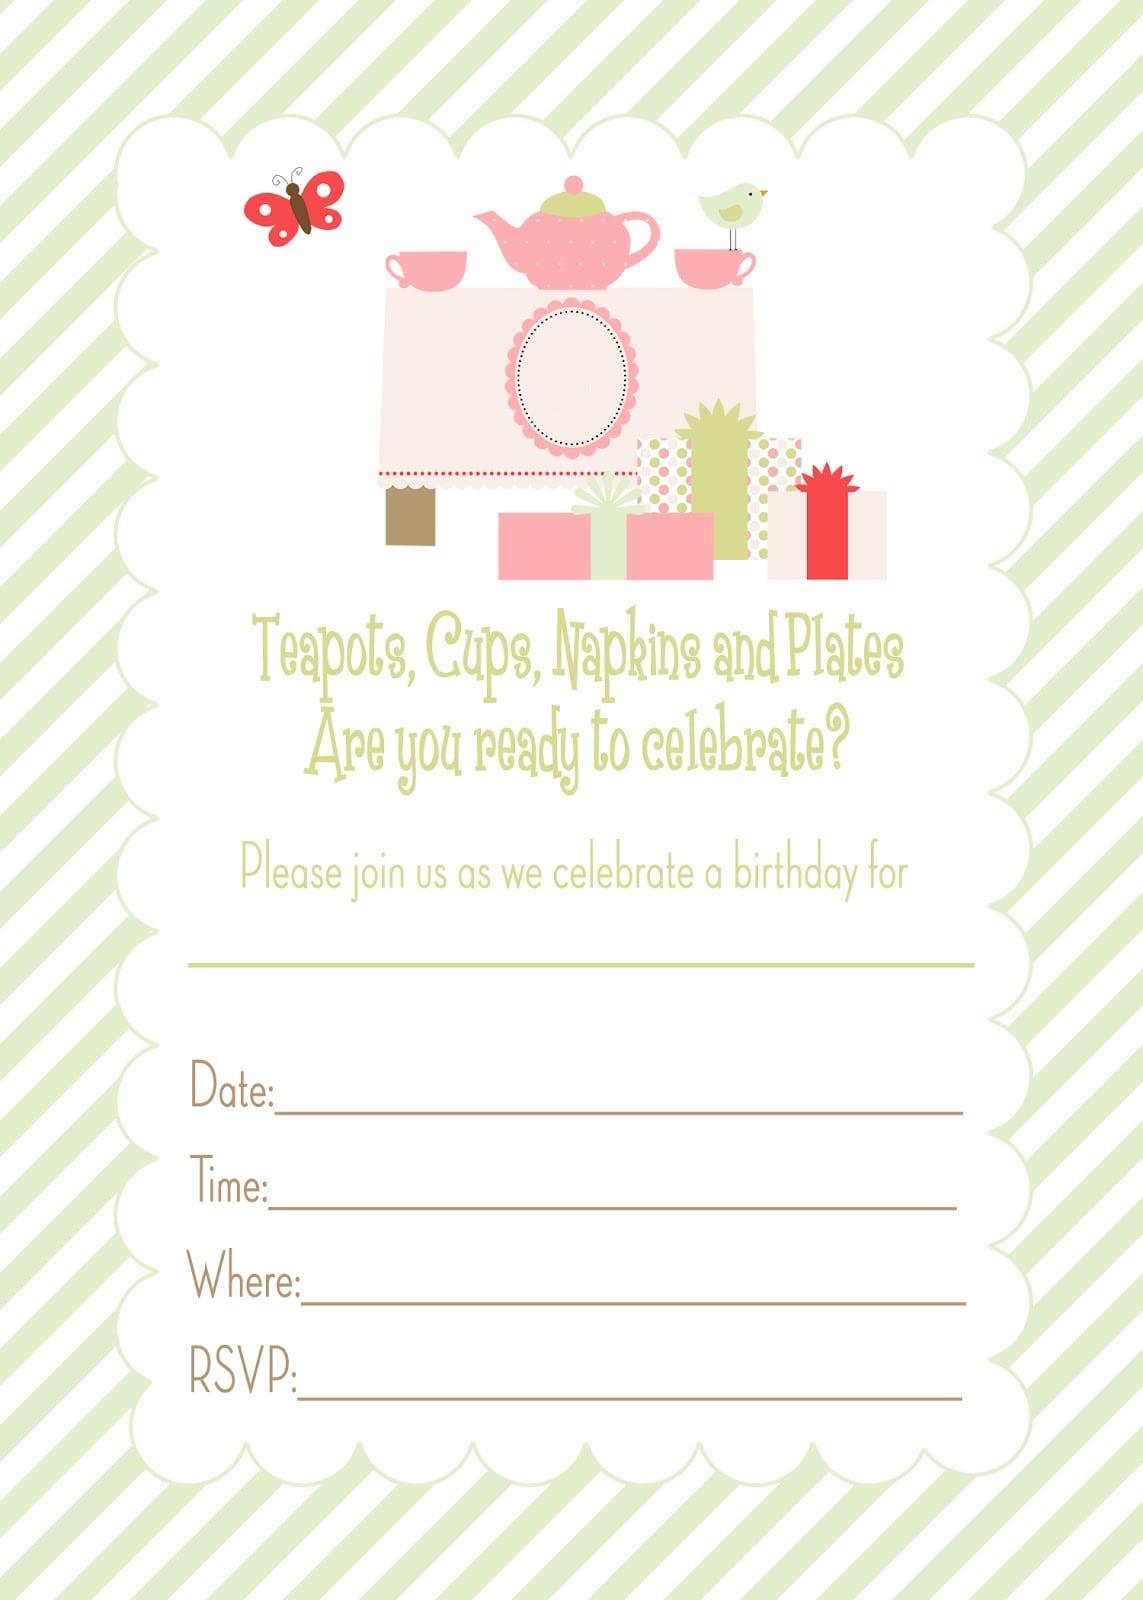 13 Year Old Birthday Invitation Template